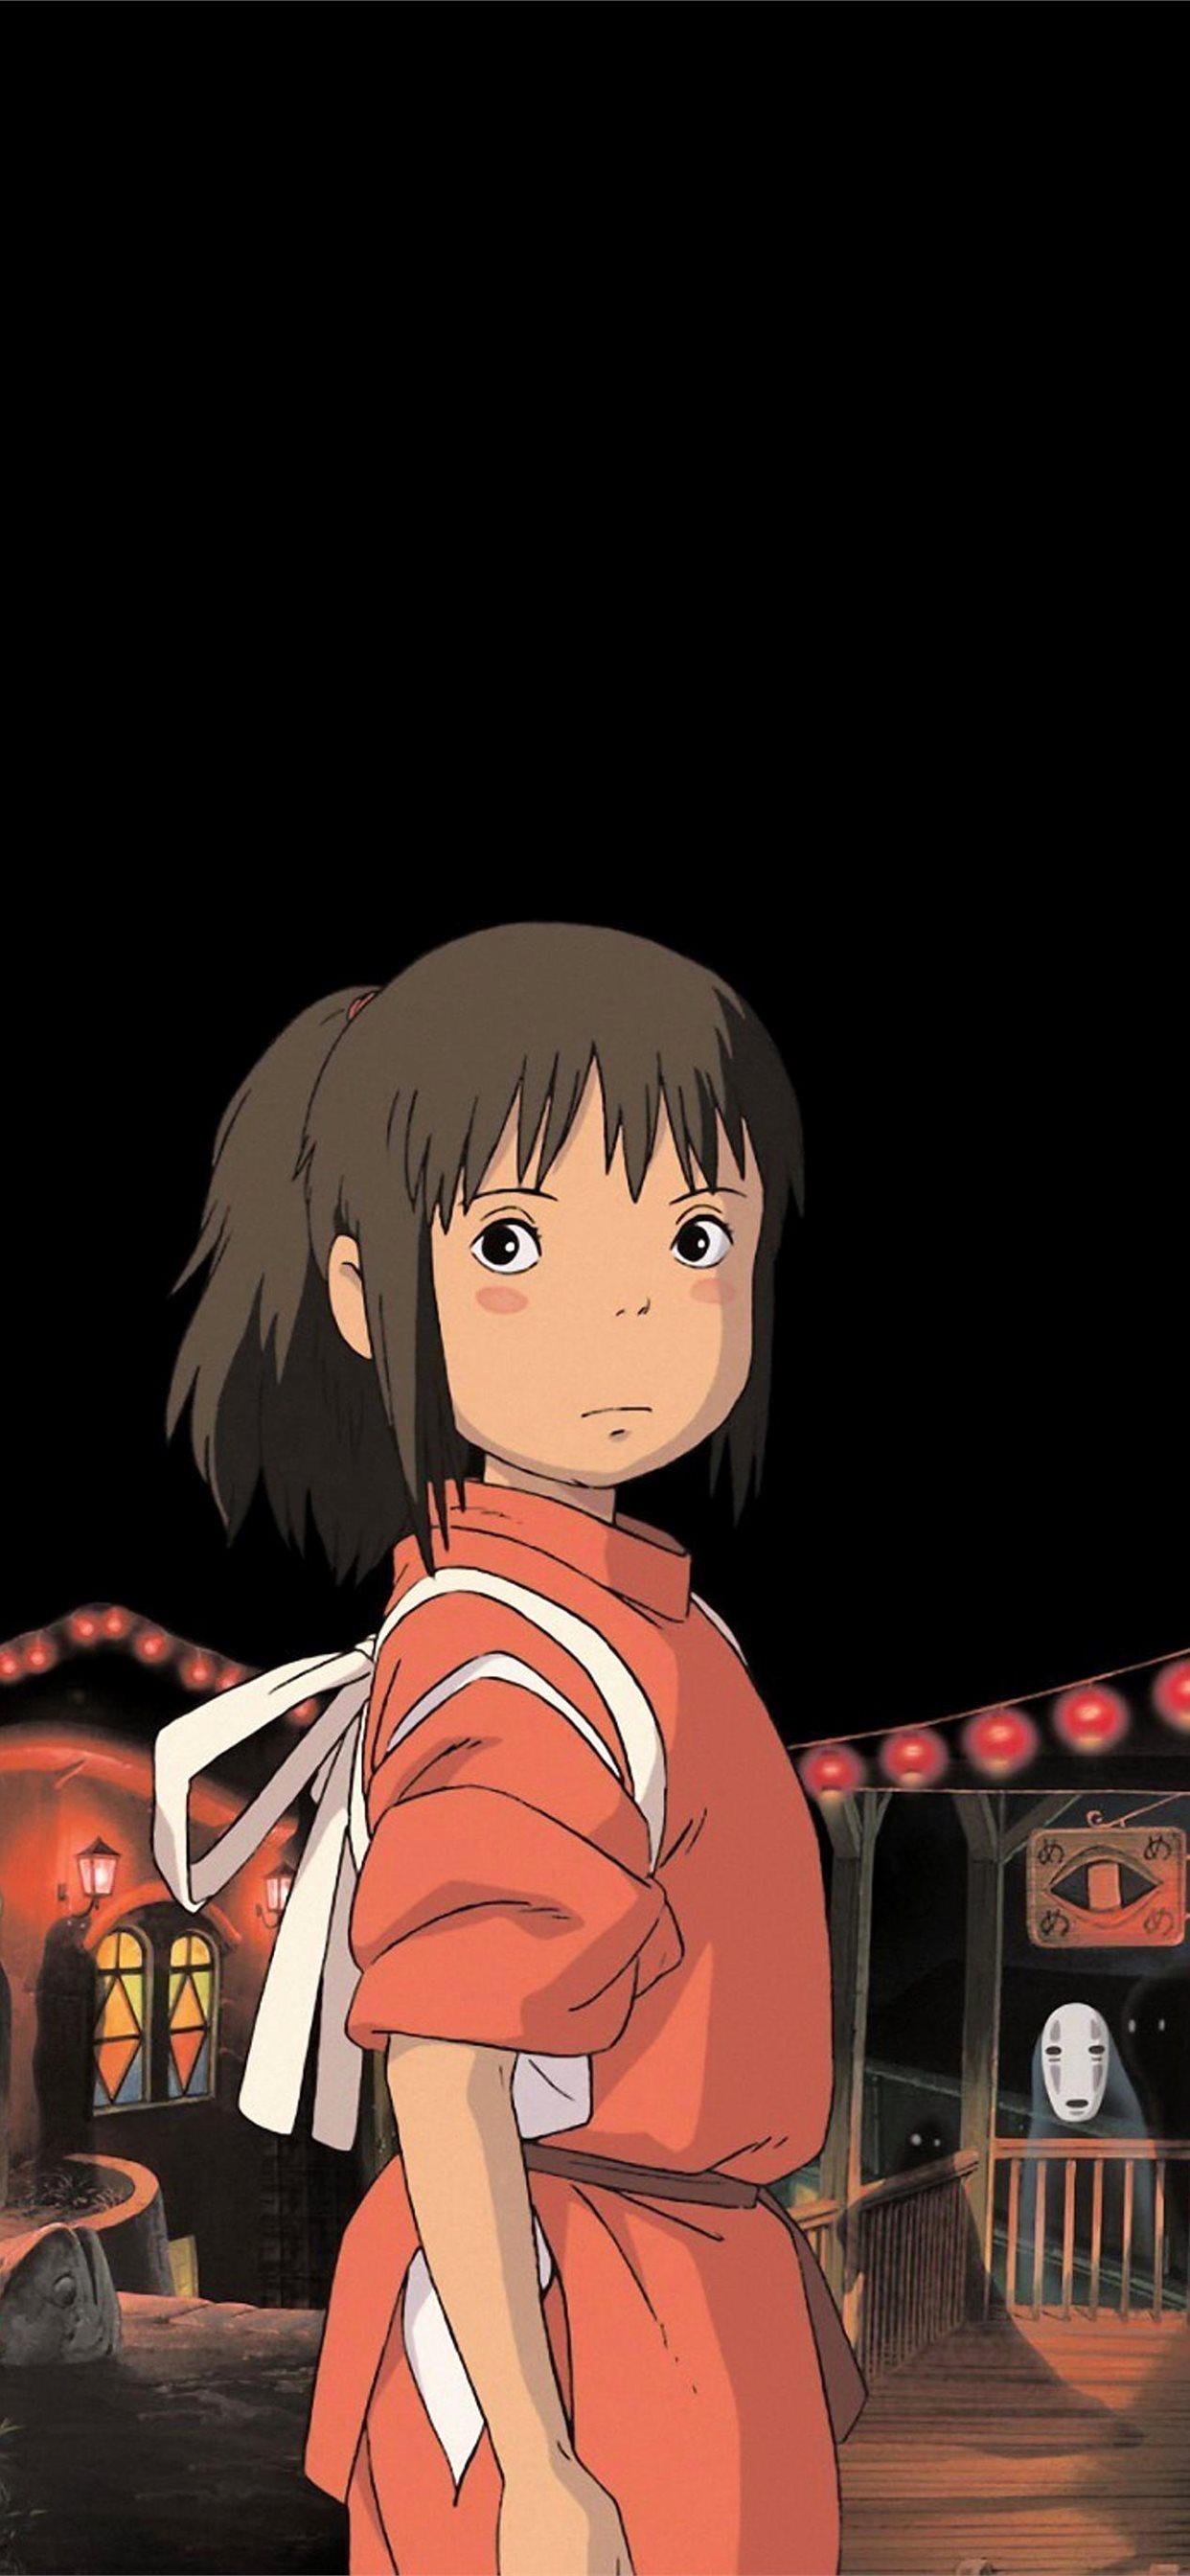 Spirited Away Phone New Studio Ghibli Iphone 11 Wallpapers Free Download